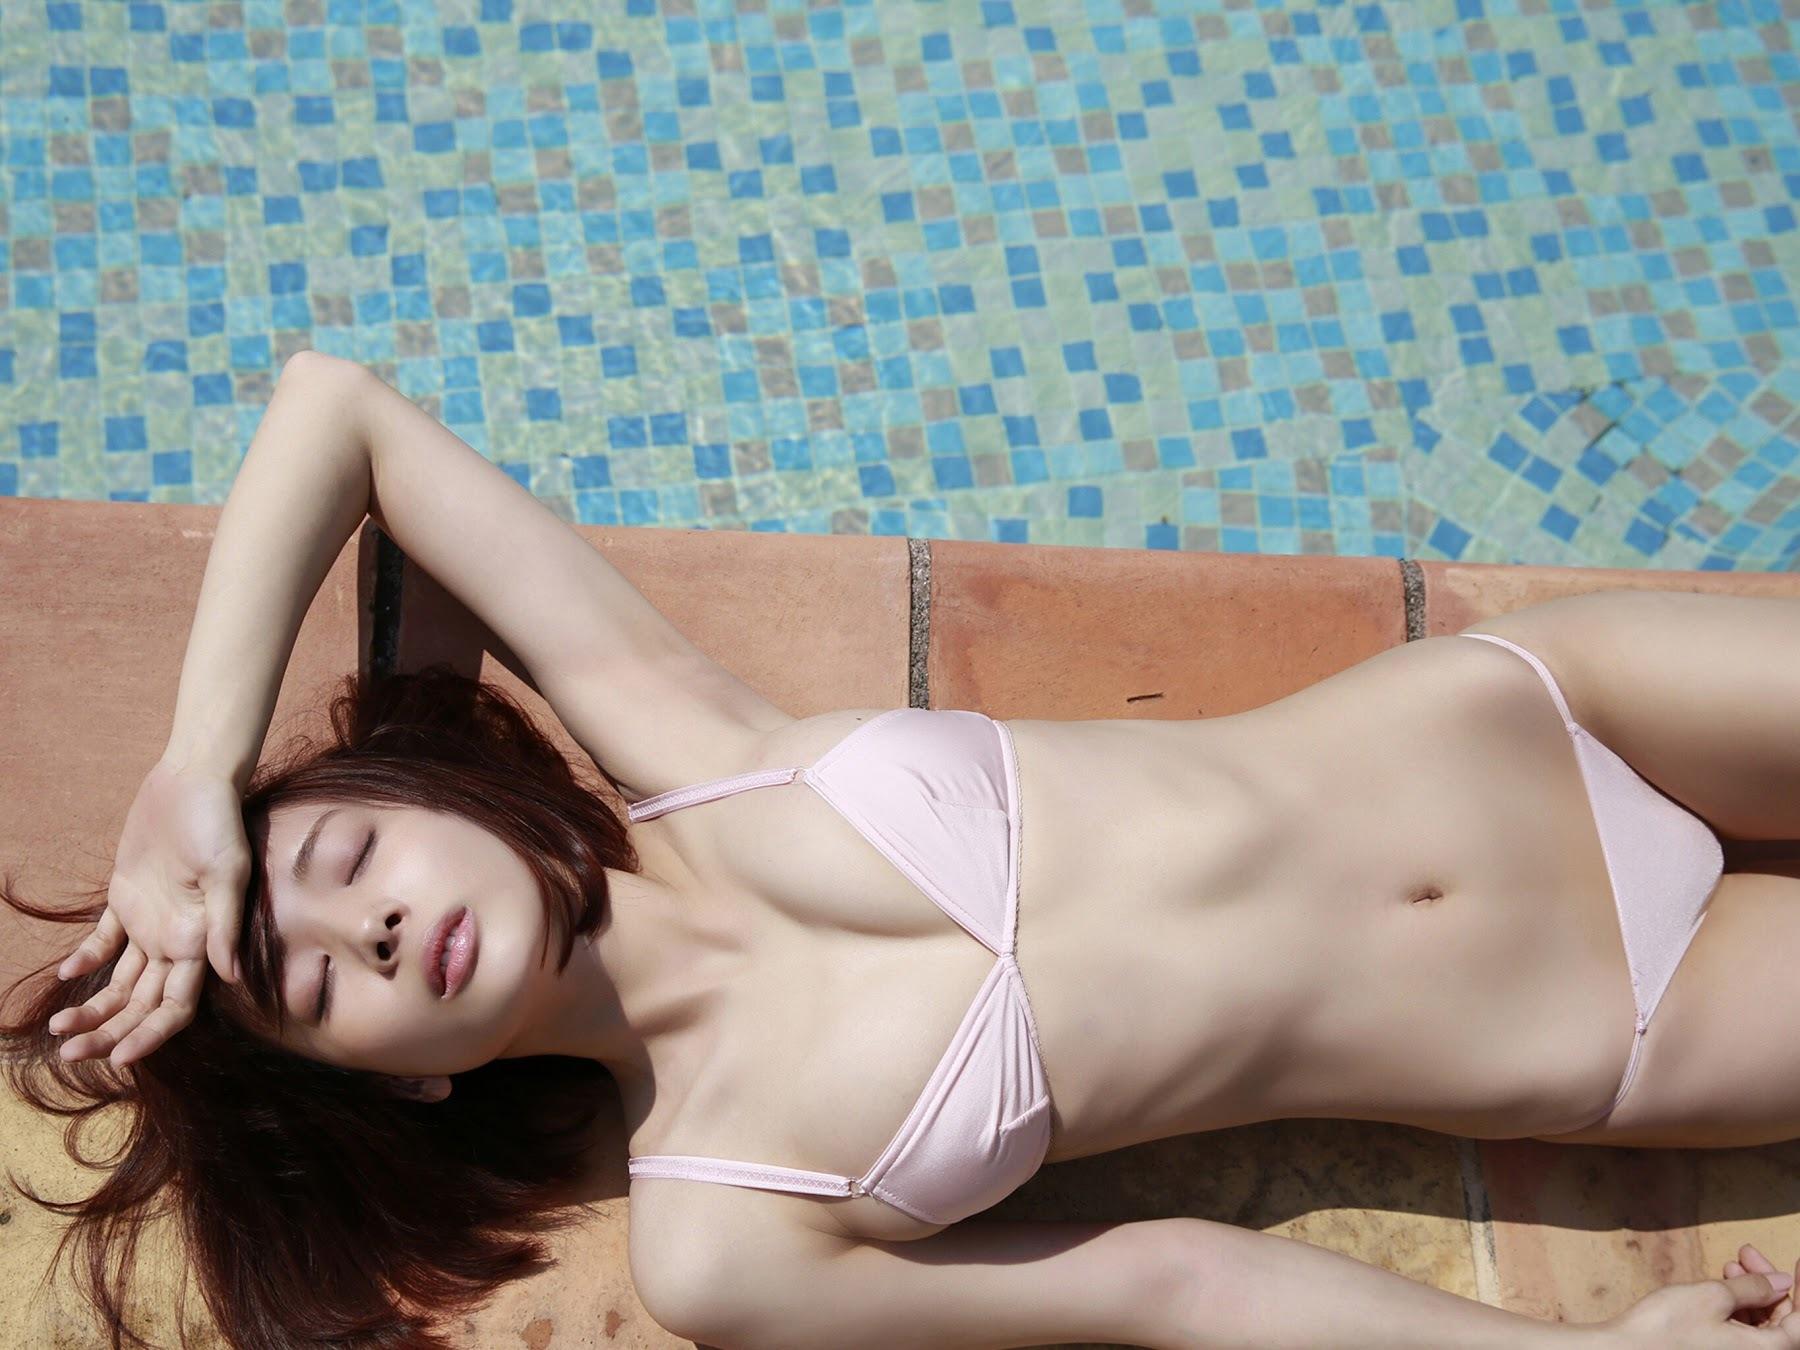 23 years old Shaka Okada, who is also a professional mahjong player005